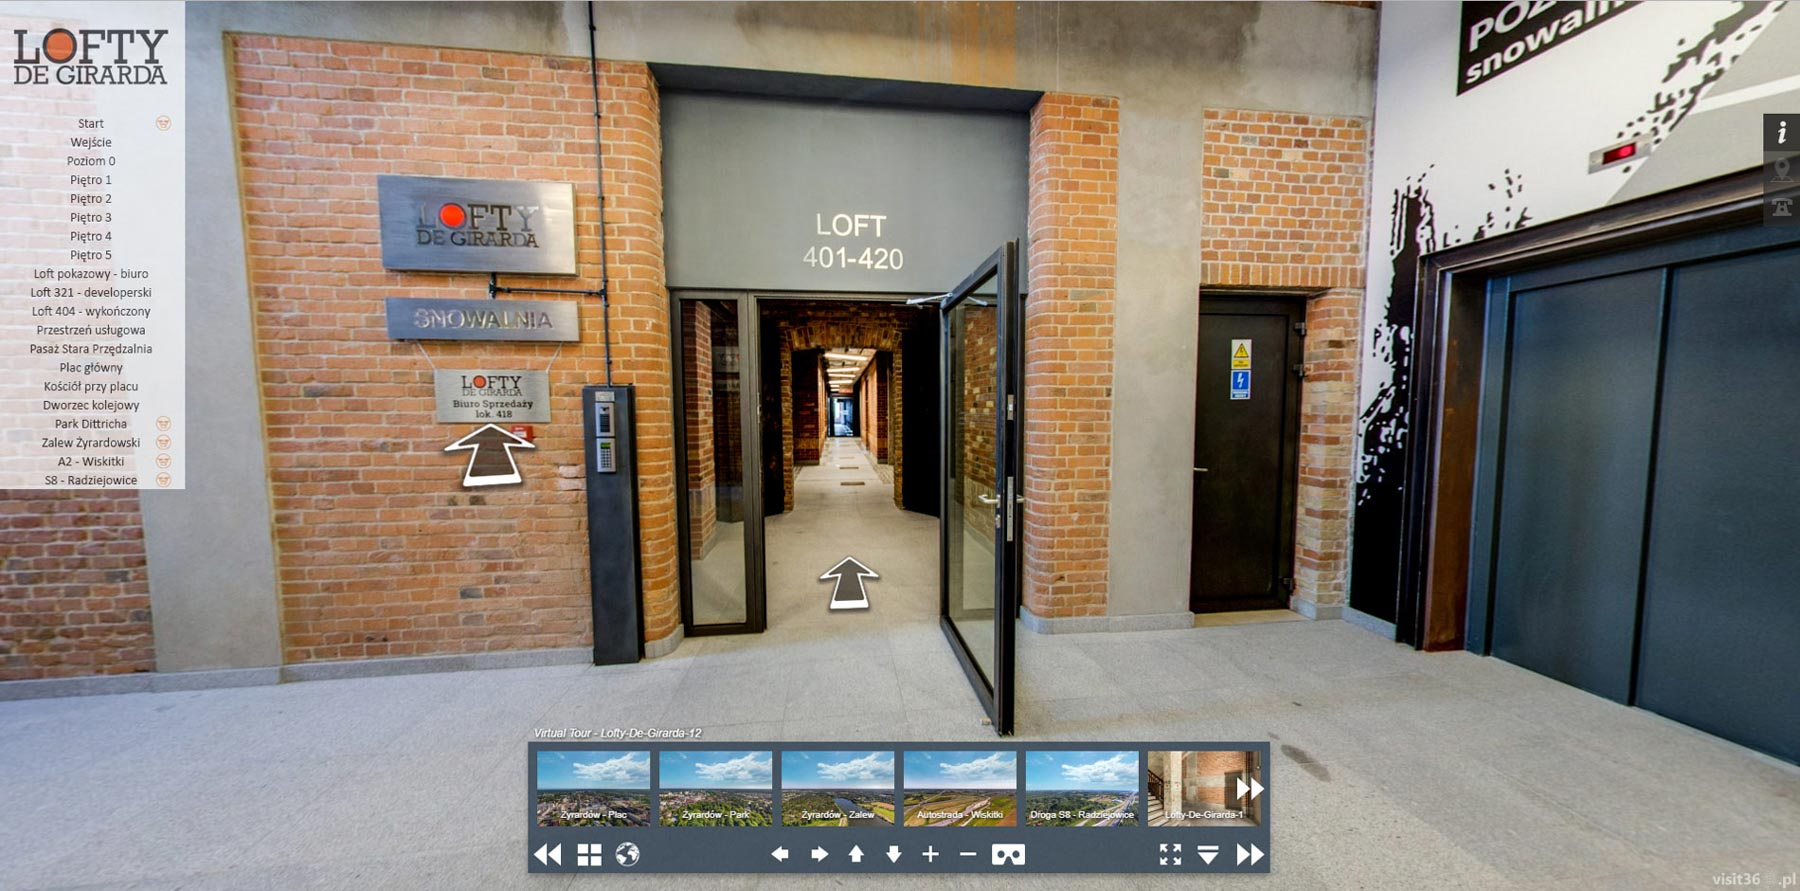 screen virtual tour lofty de girarda 3. Black Bedroom Furniture Sets. Home Design Ideas